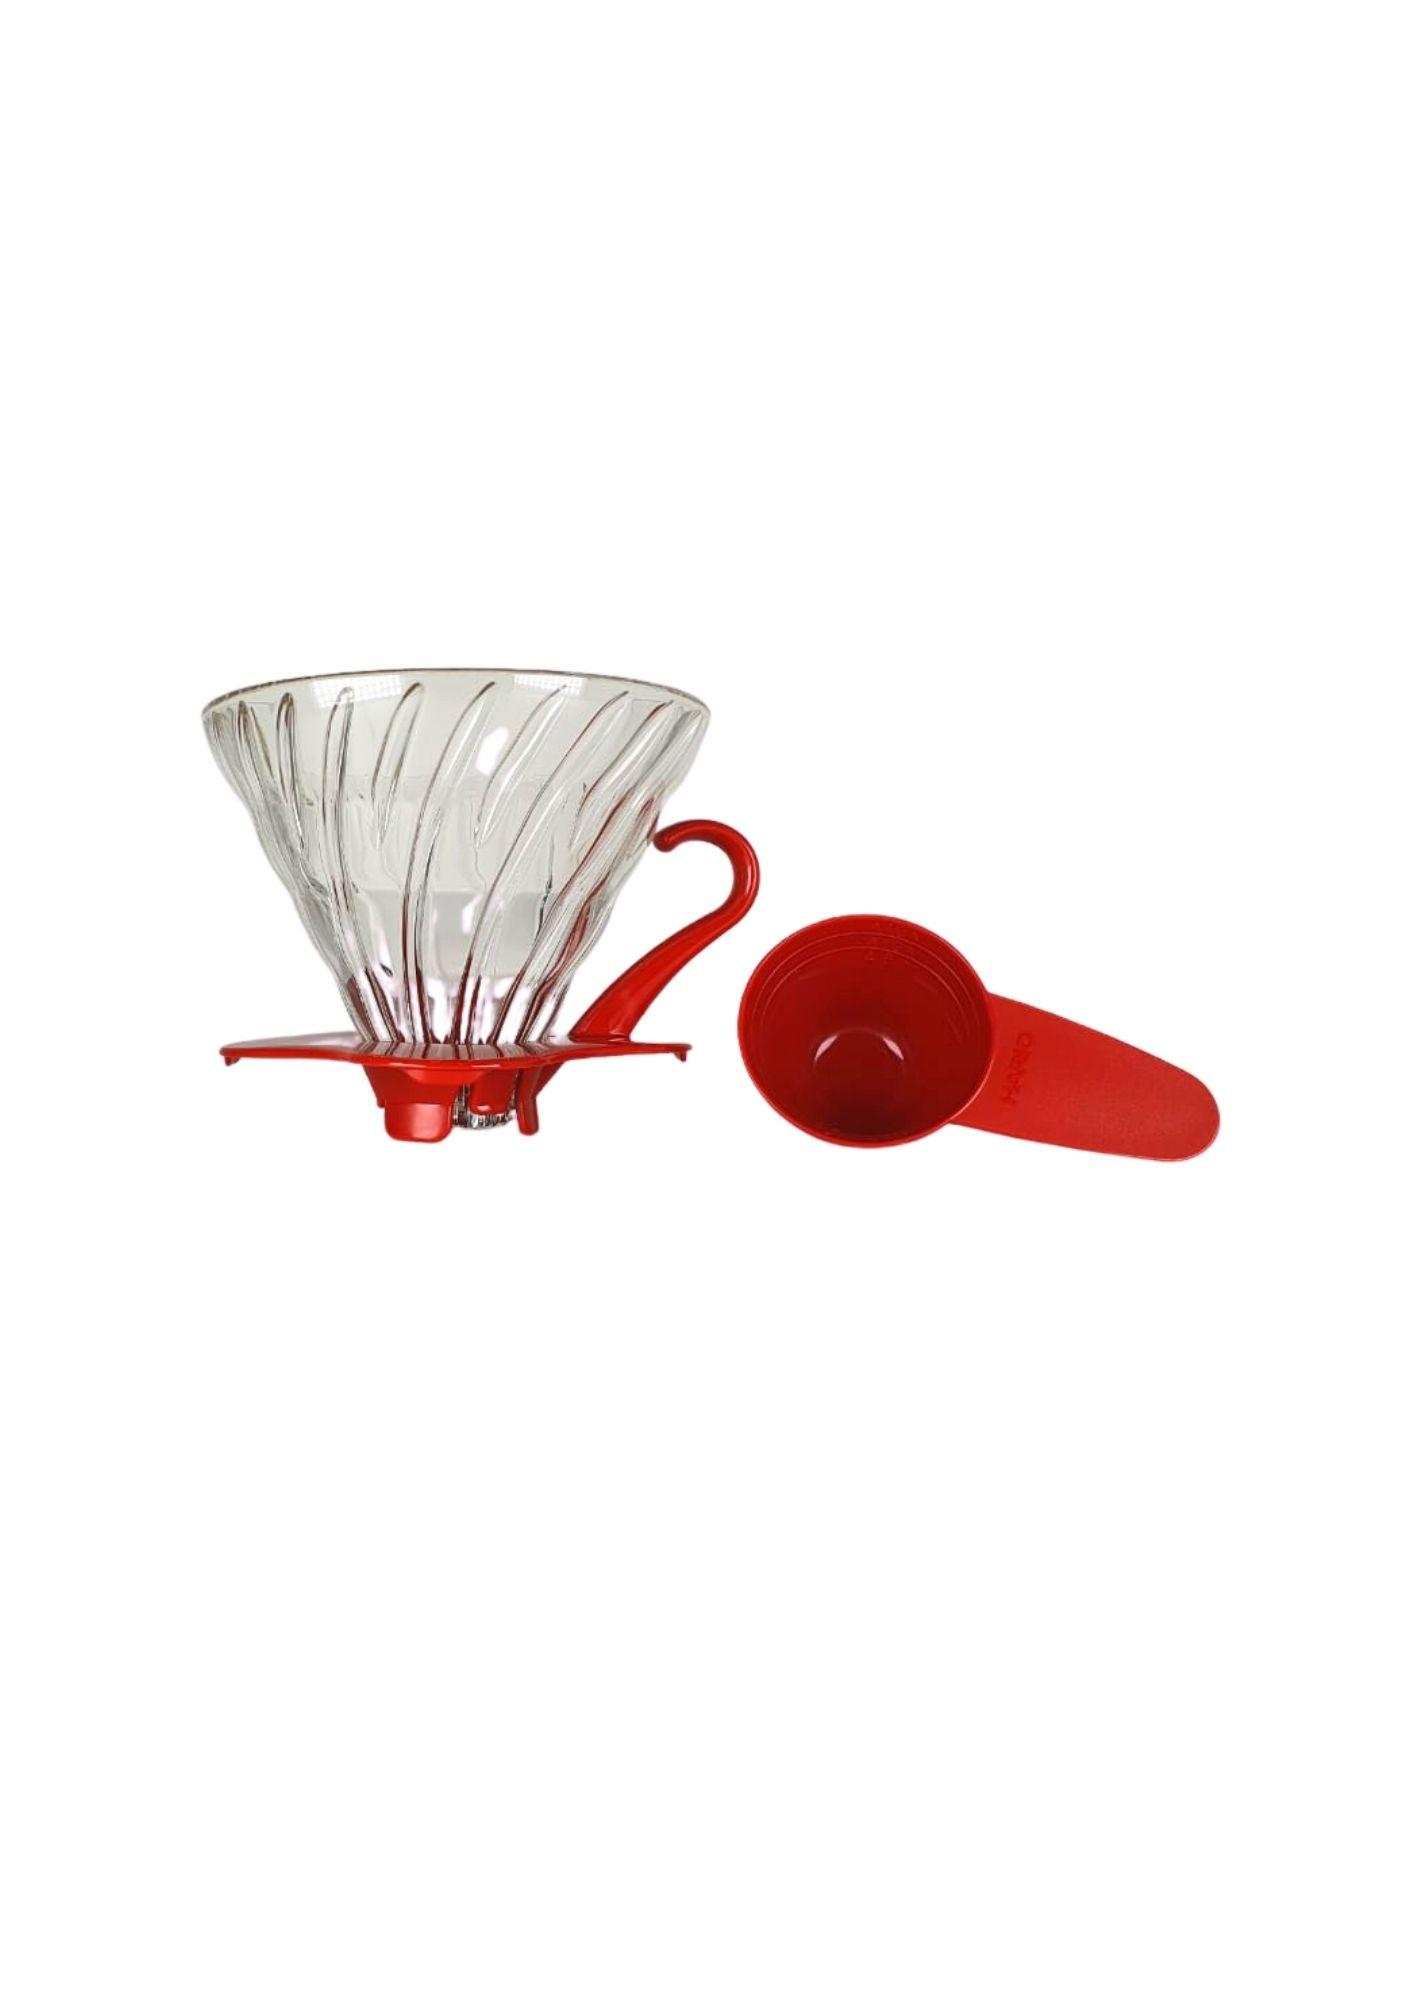 HARIO COADOR CAFE V60 02 VDG-02 RED